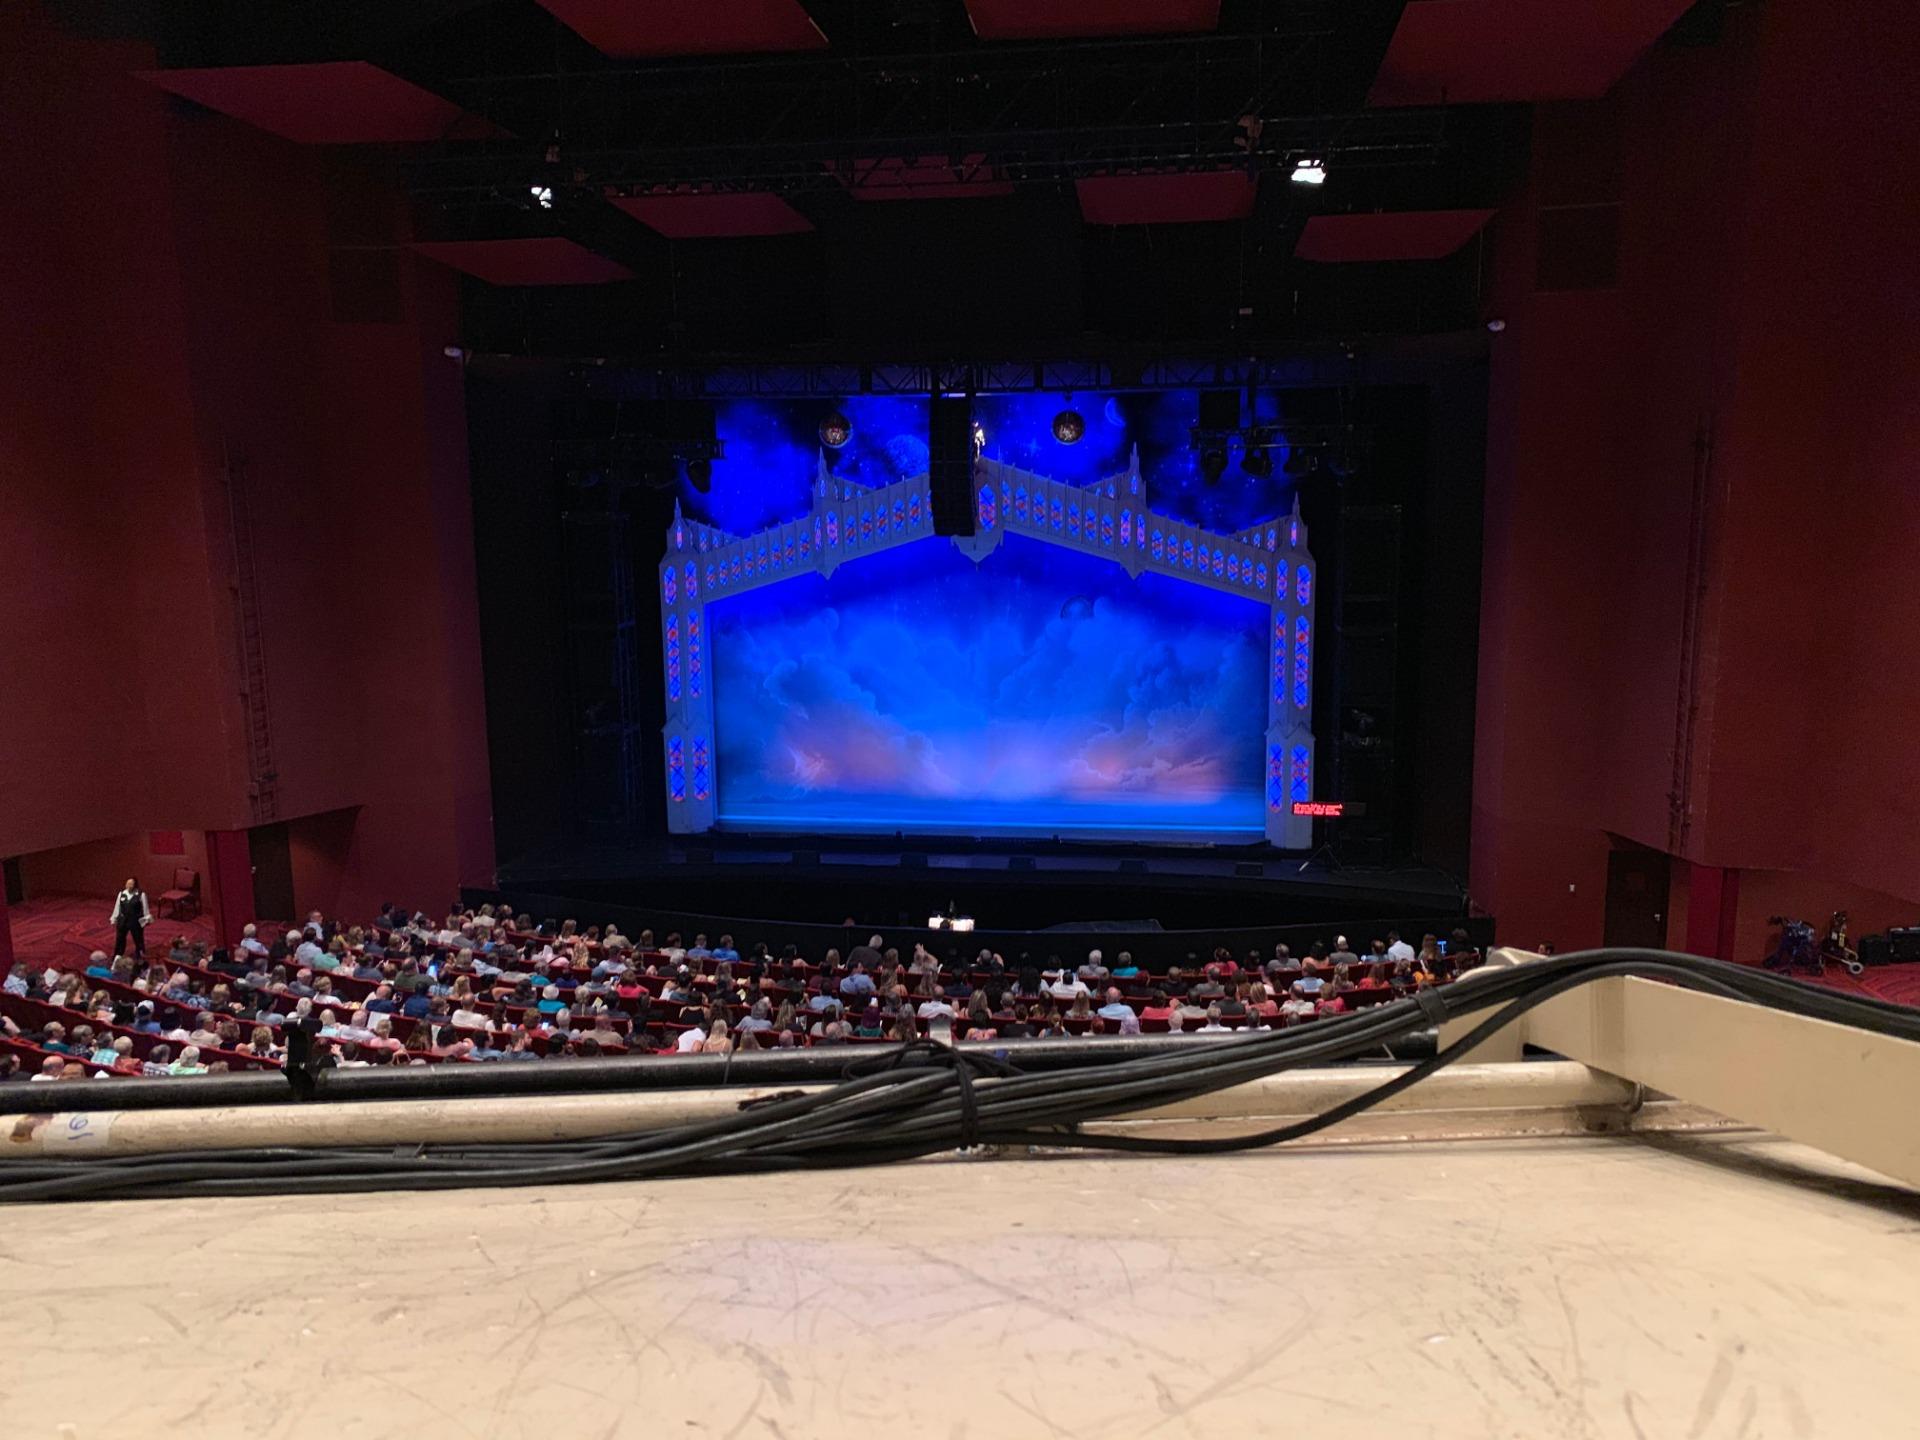 San Diego Civic Theatre Section MEZZR1 Row O Seat 14